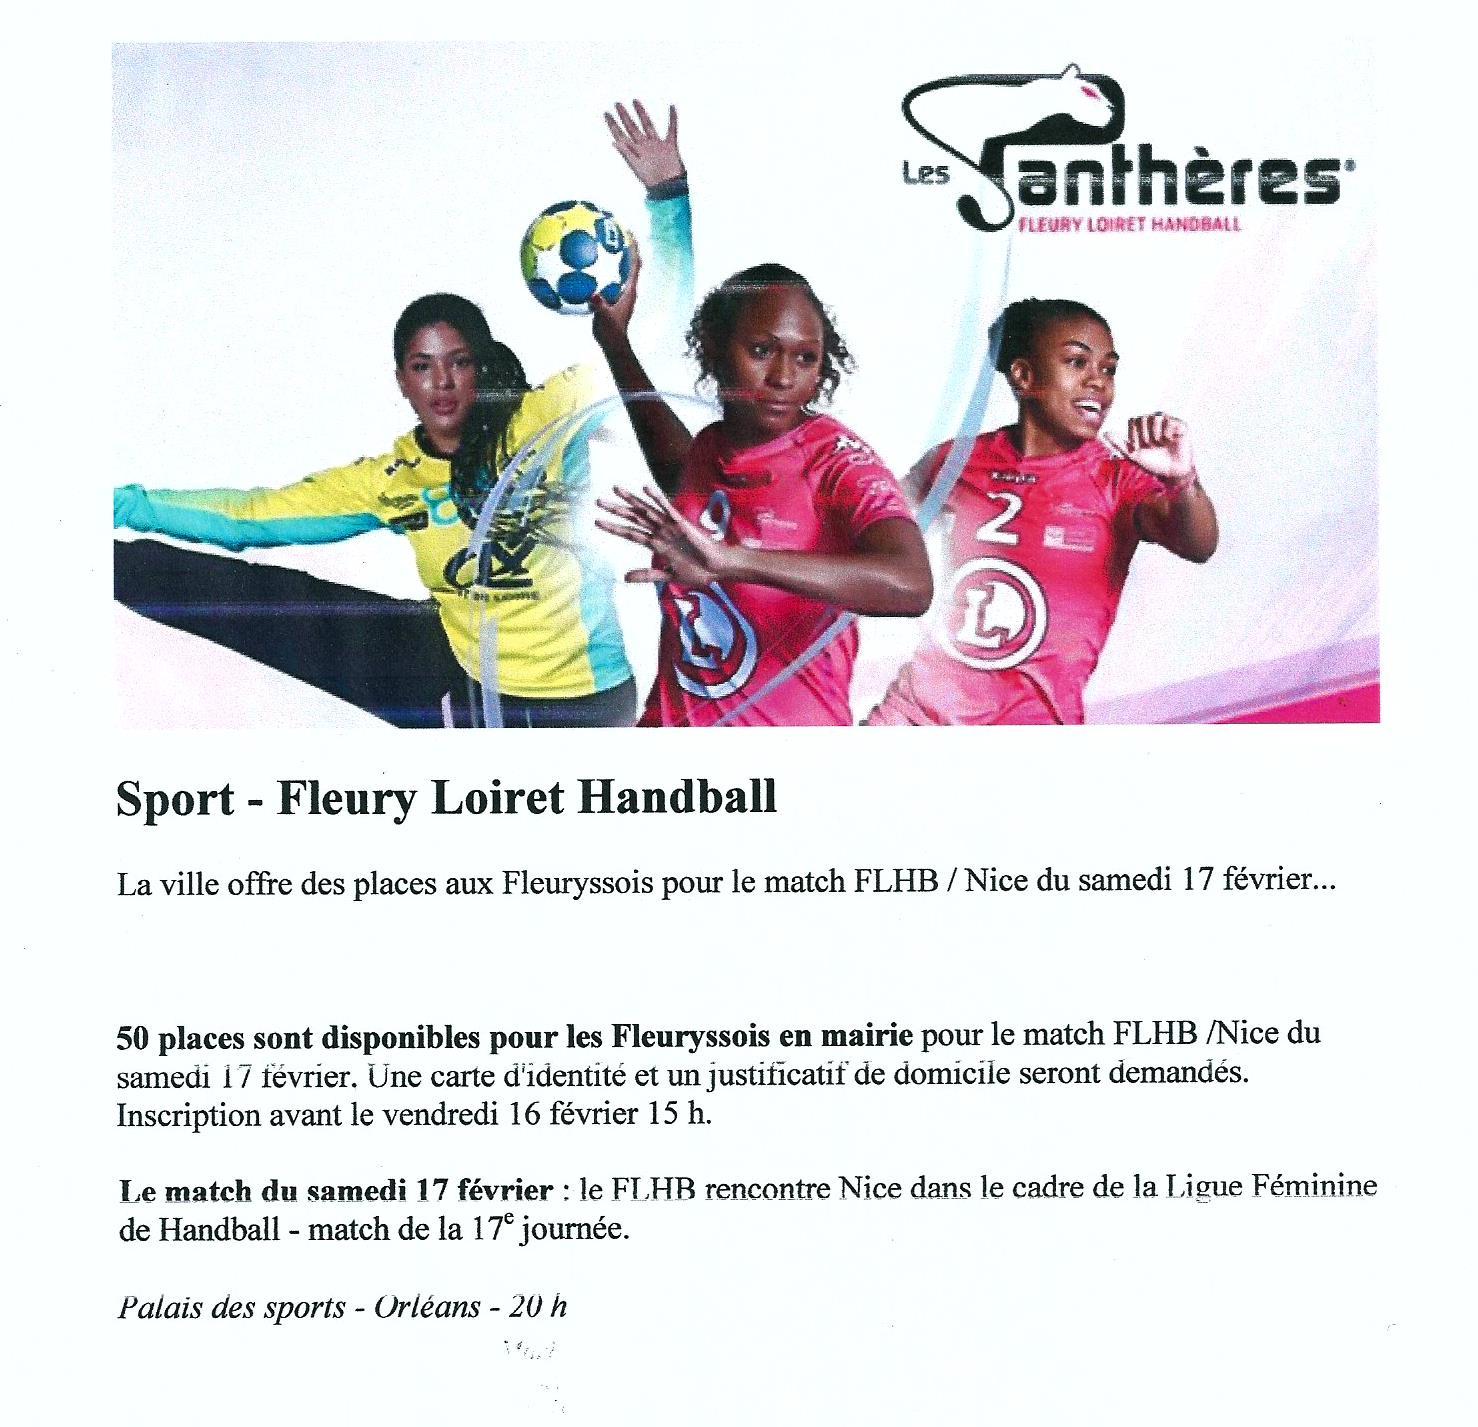 Scan Affiche Sport-Fleury Loiret Handball 2018 (17.02.2018).jpg